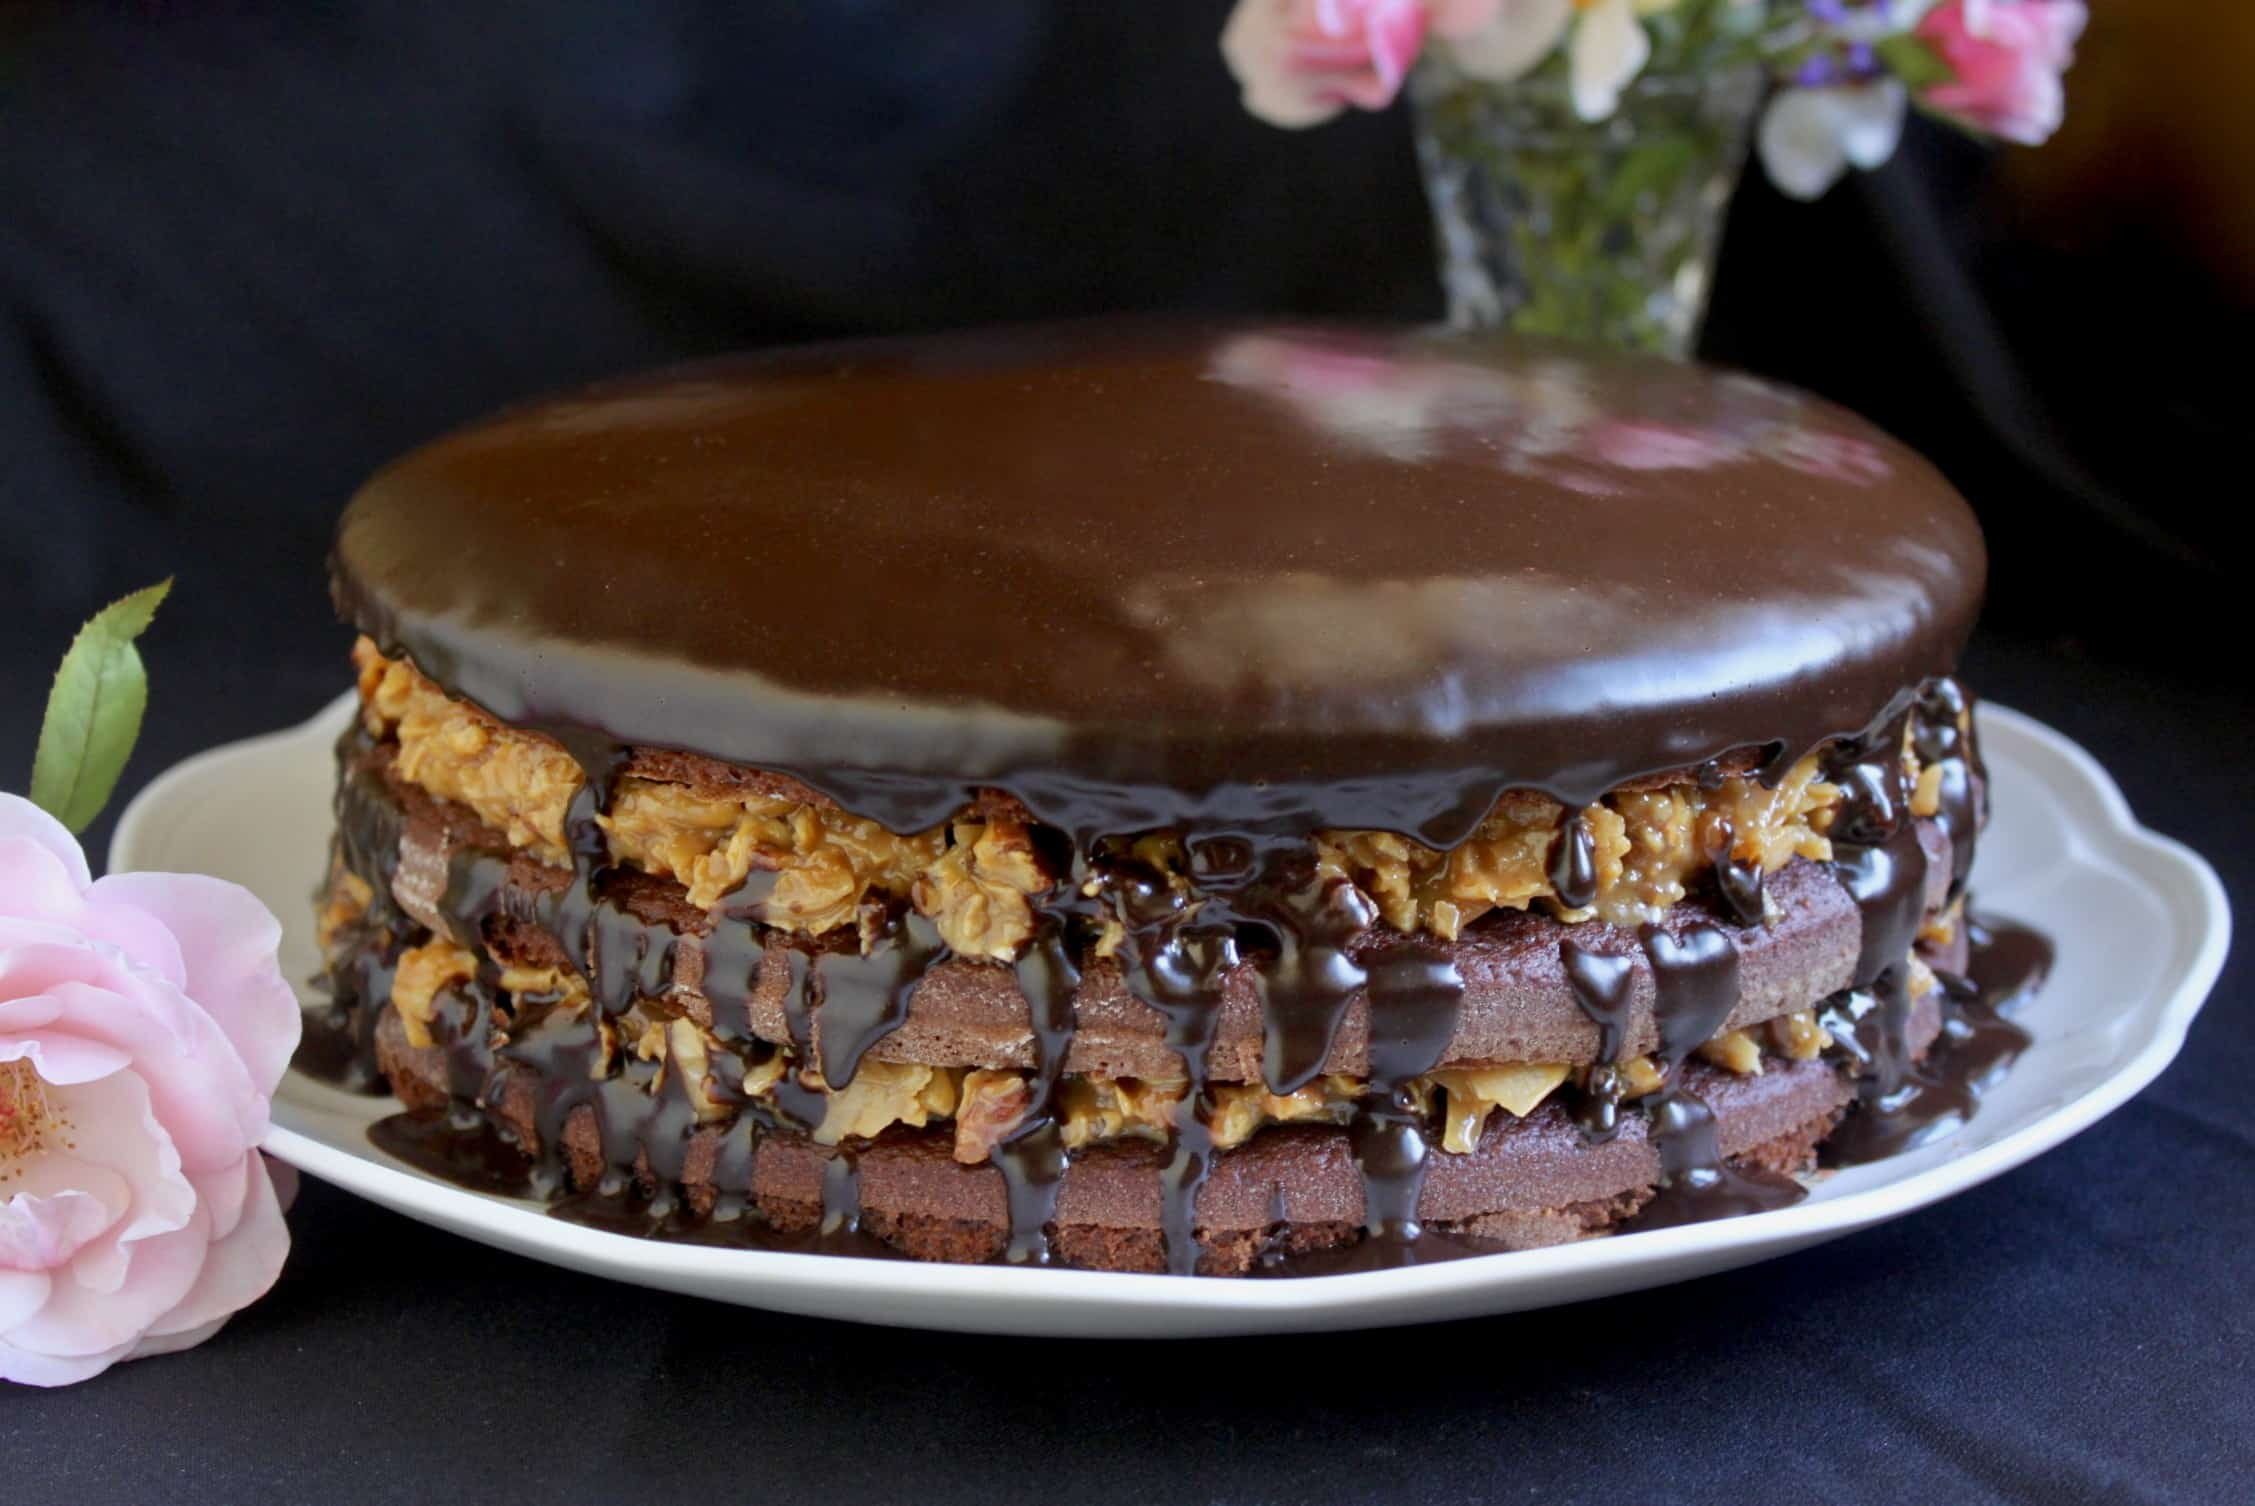 German Chocolate Cake with ganache